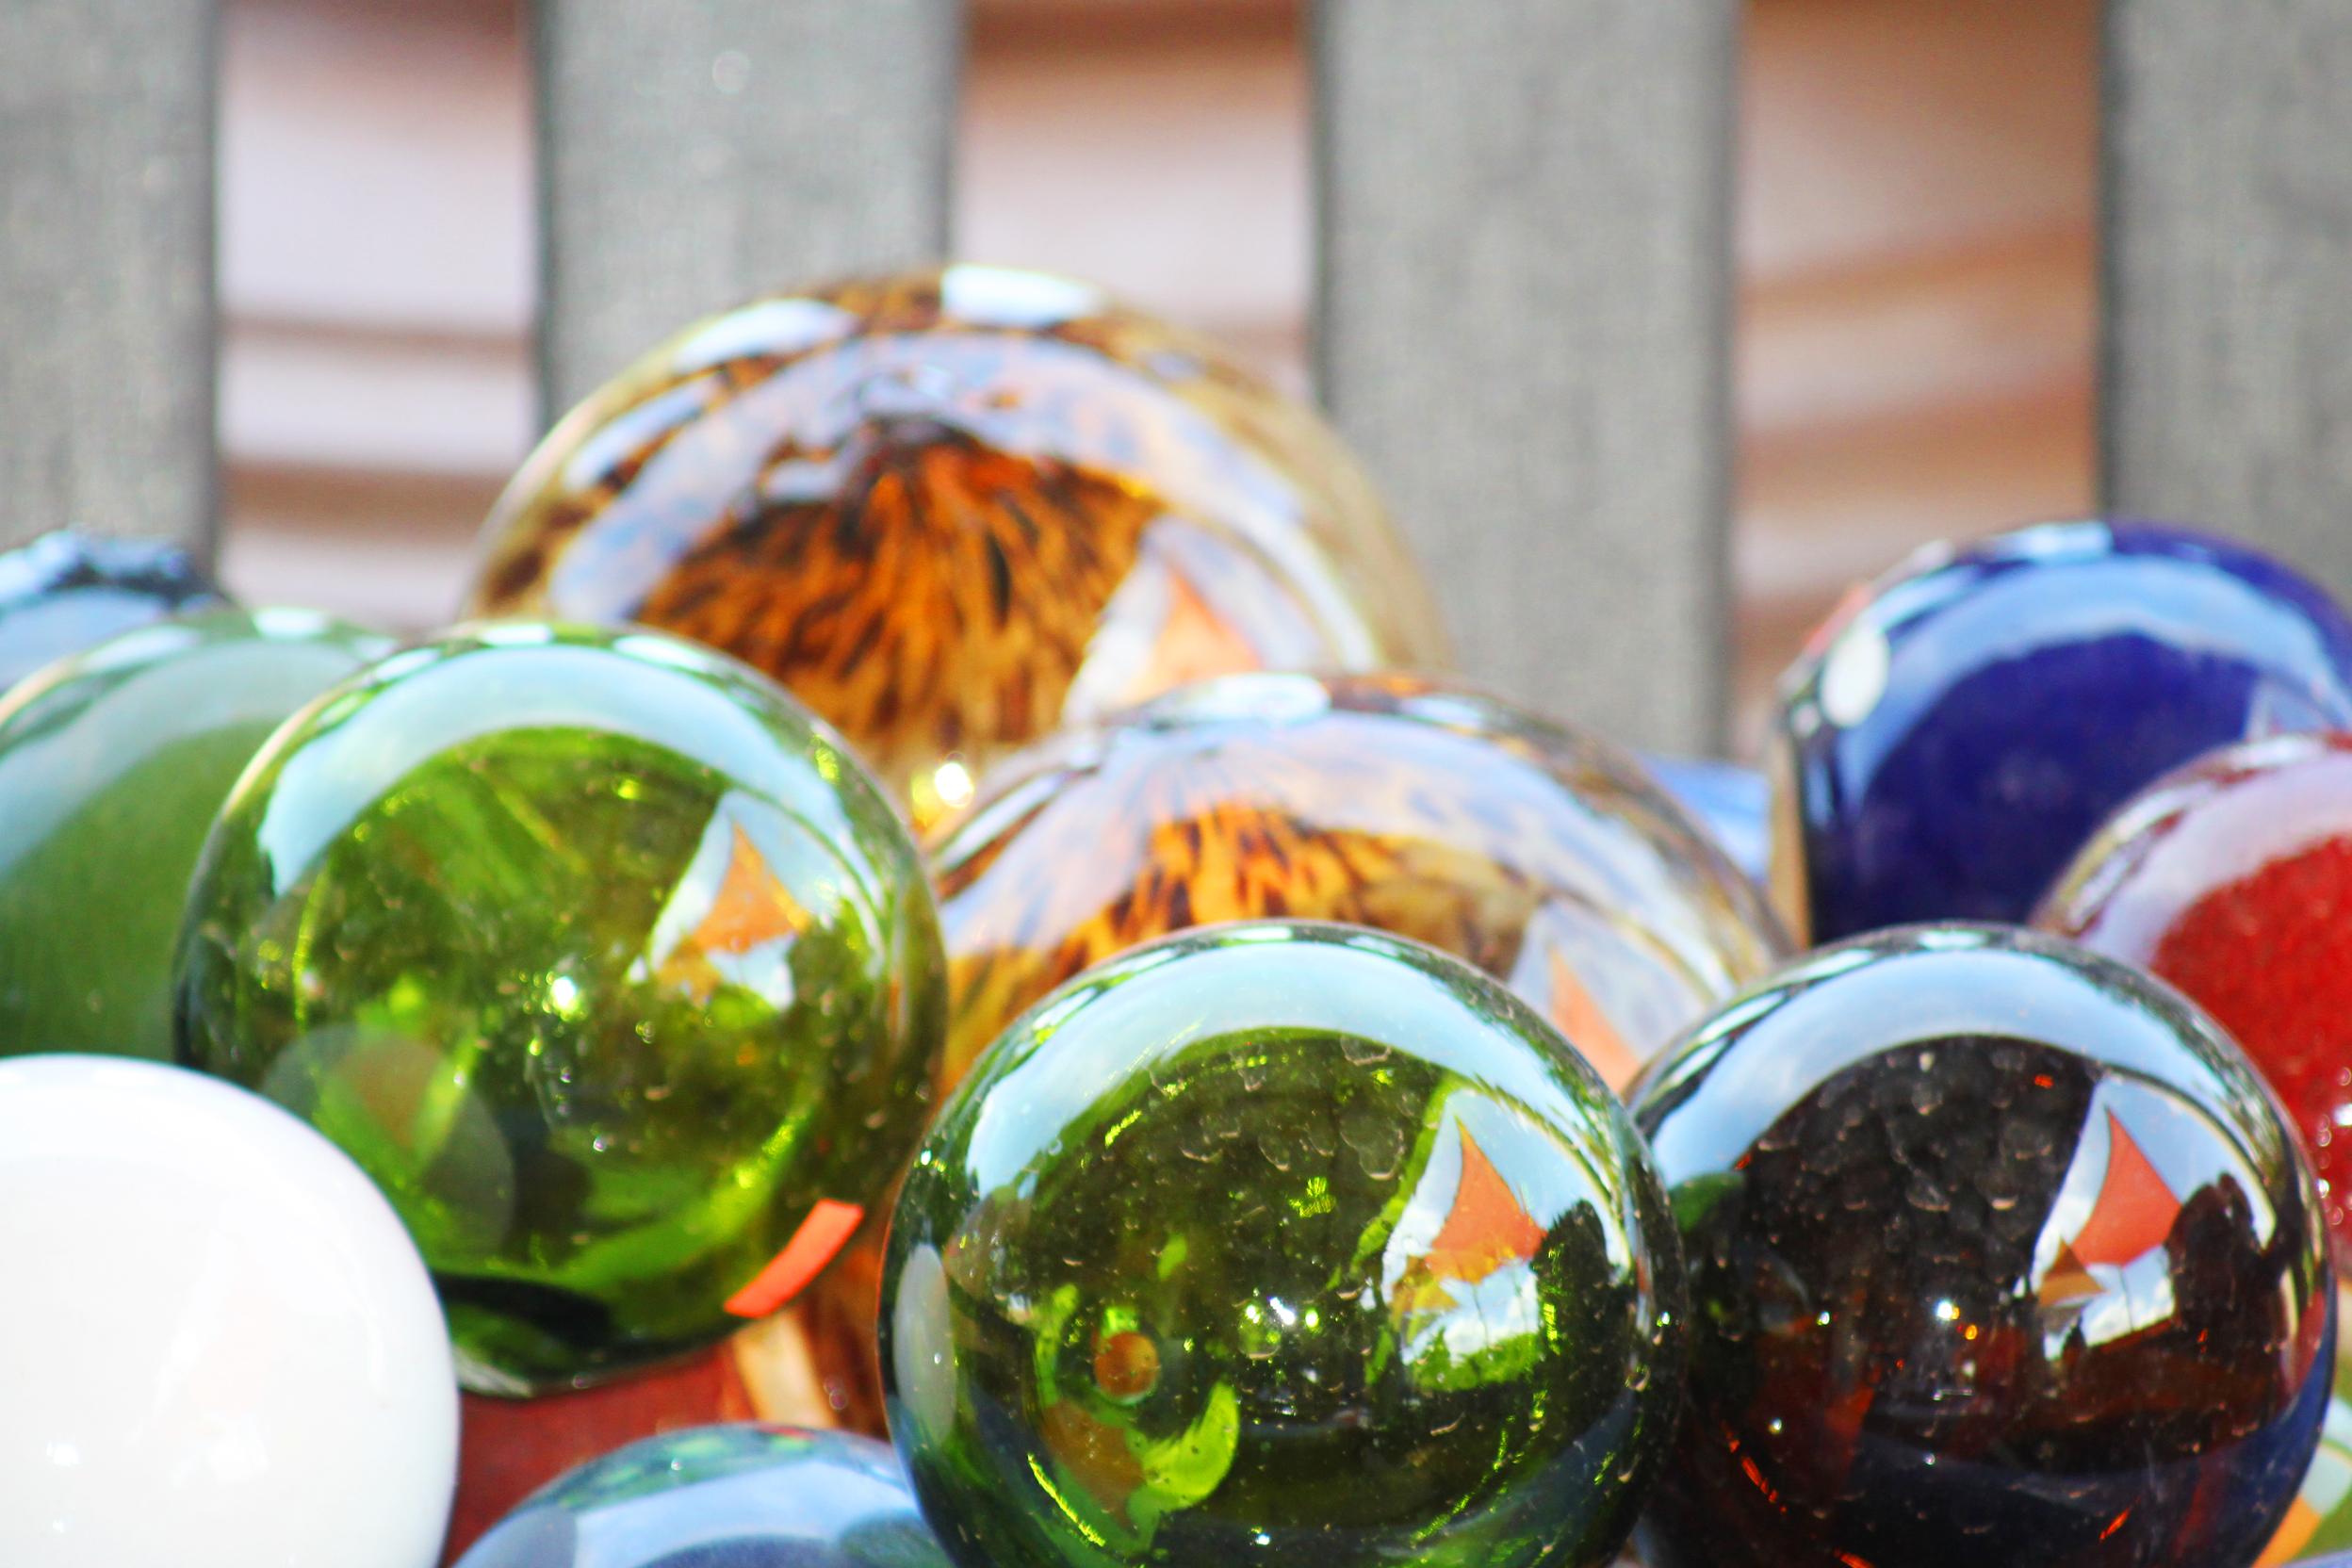 Glass balls, Backdrop, Seasonal, Ornament, Ornate, HQ Photo